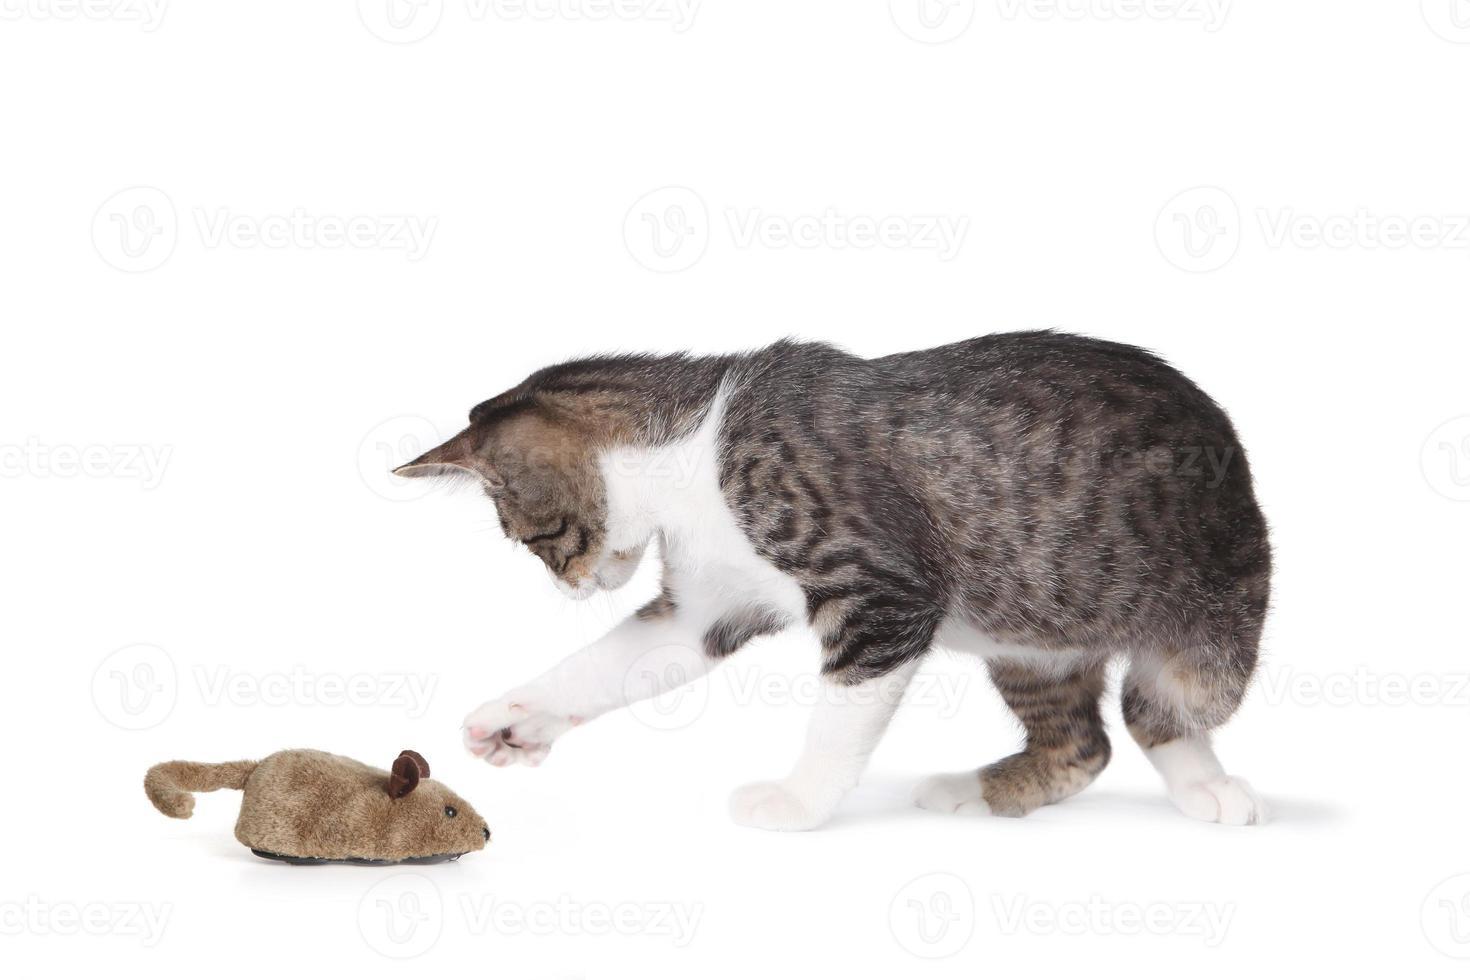 gato gracioso y ratón falso foto